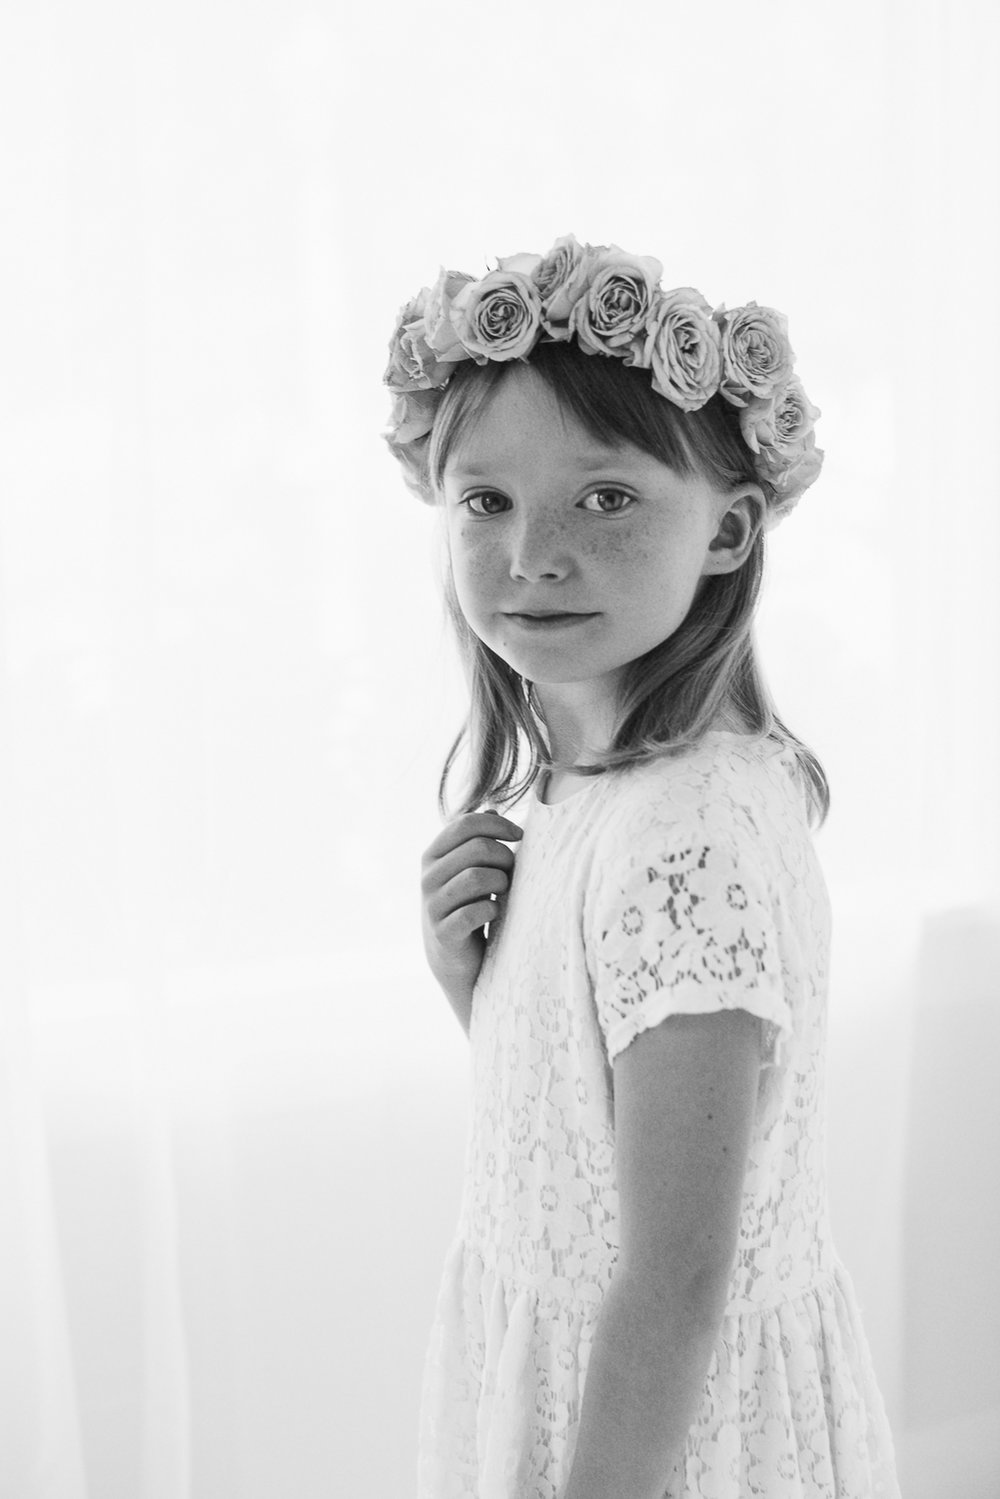 2cedarsphoto-bw-portrait-girl.jpg